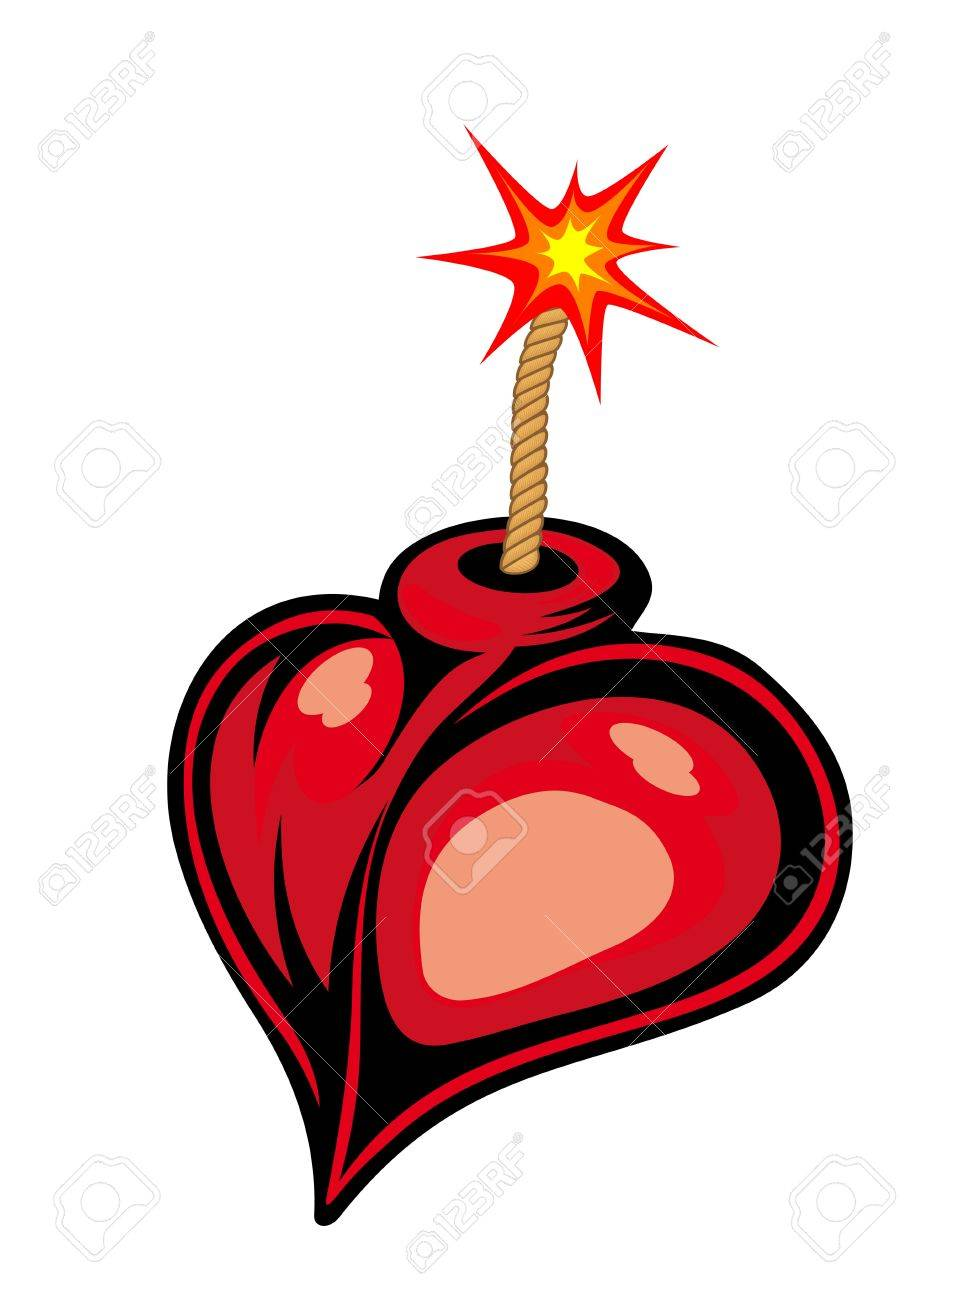 Cartoon heart bomb isolated on white background Stock Vector - 13194227